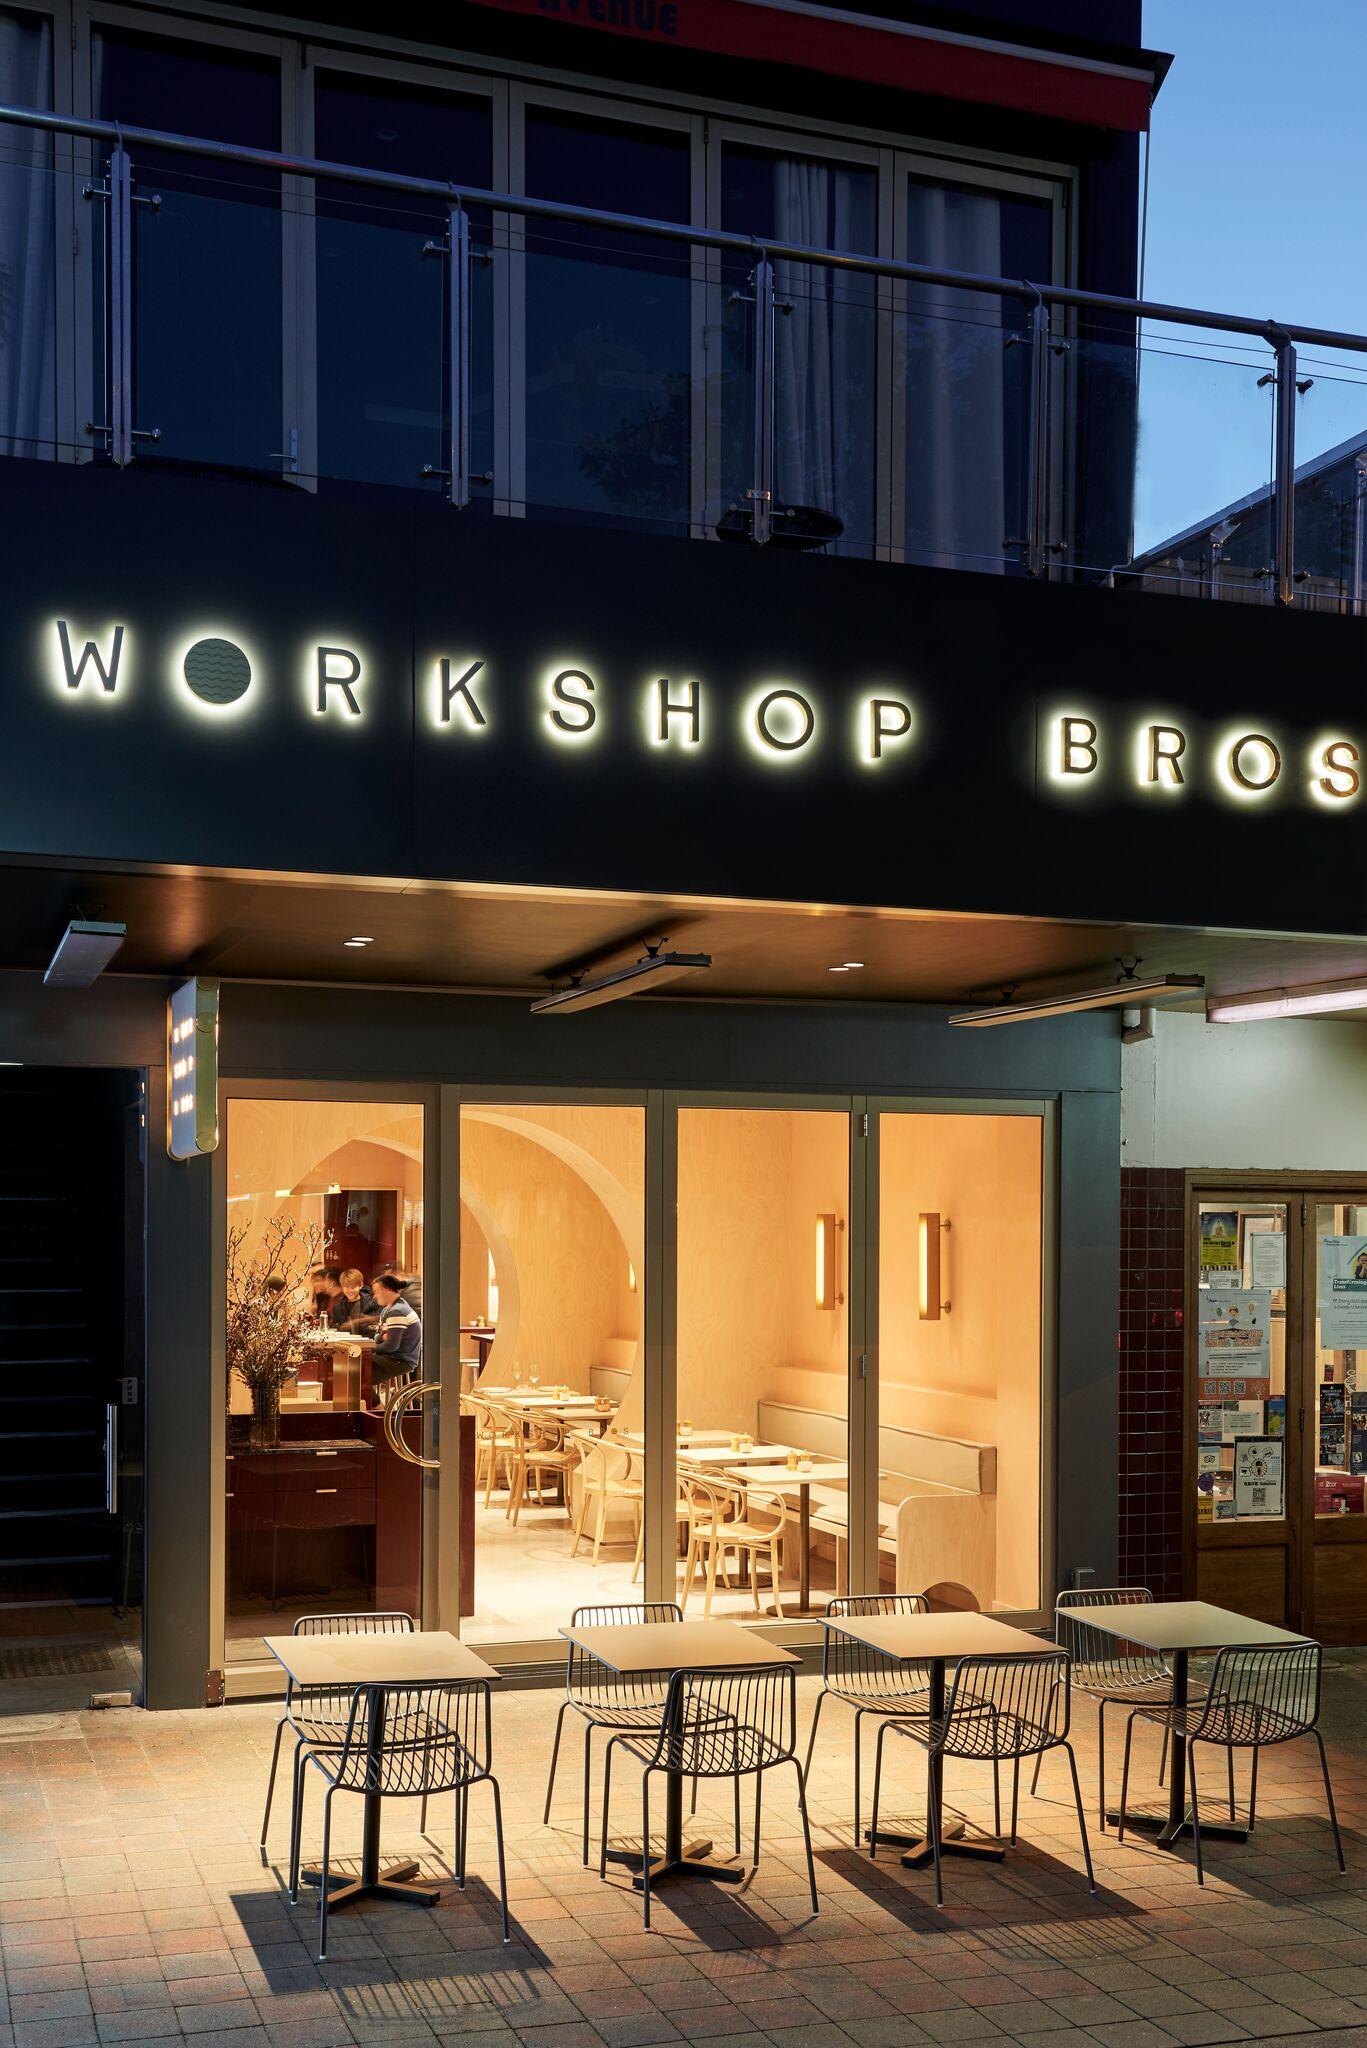 Workshop Bros - Glen Waverley - Interior - Food Win Design - Image 1